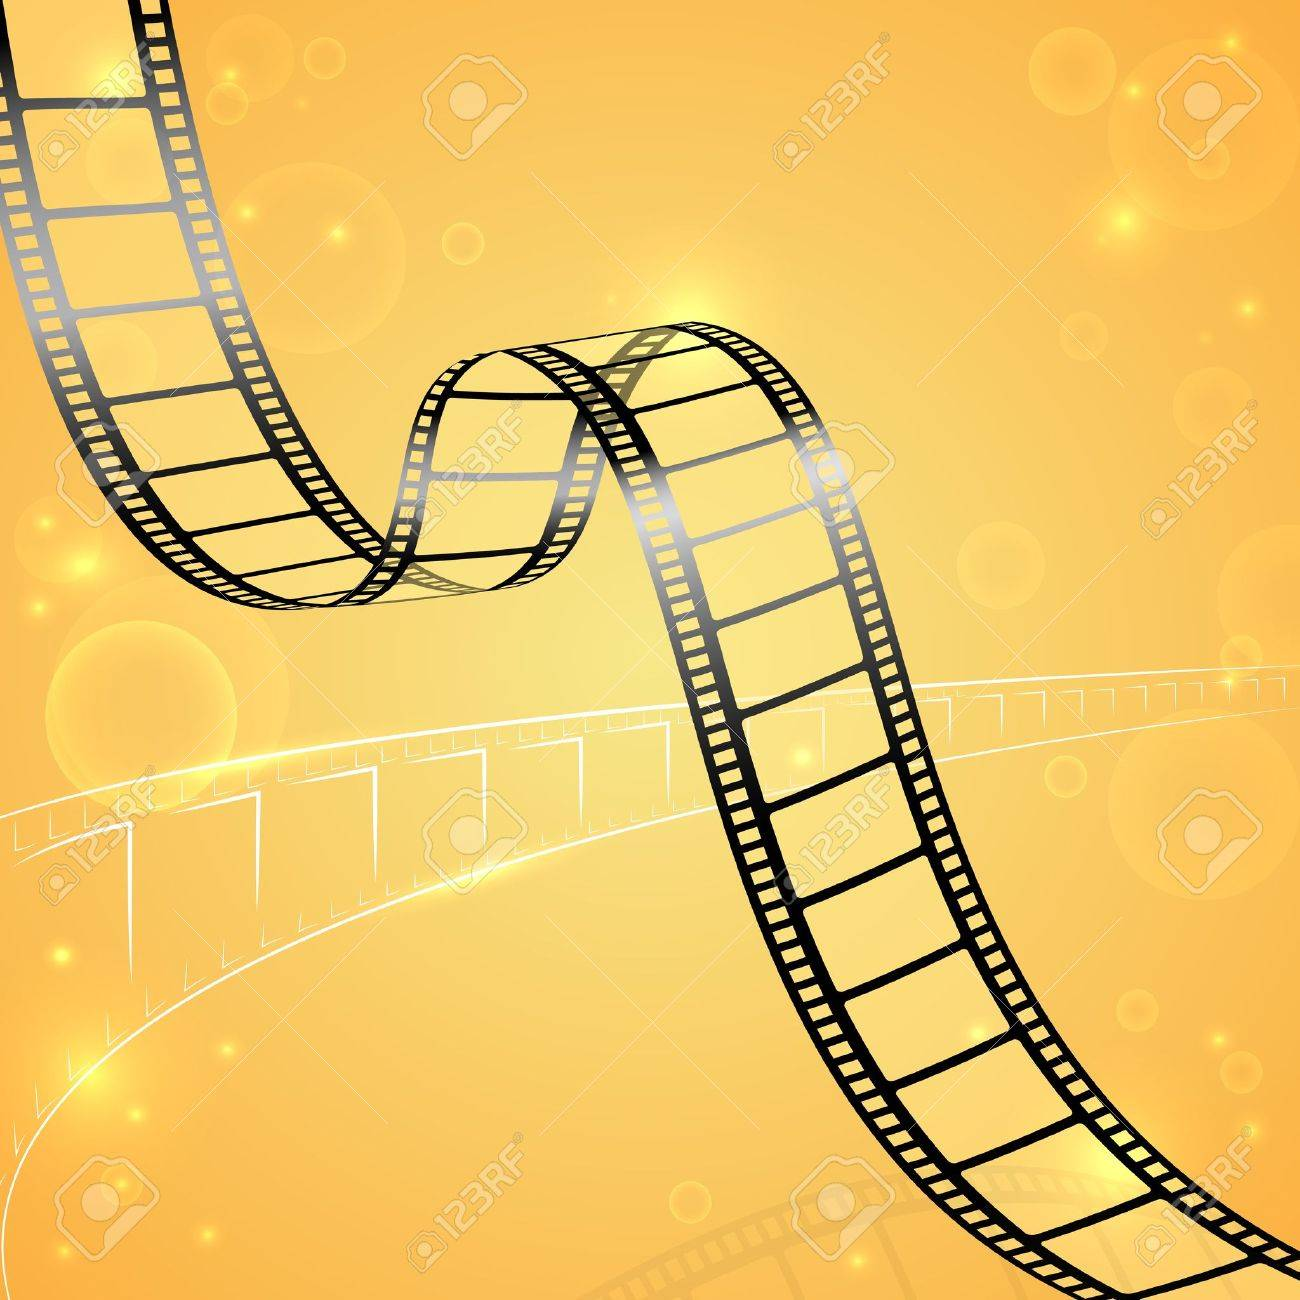 Film Strip Background Stock Vector - 19658852